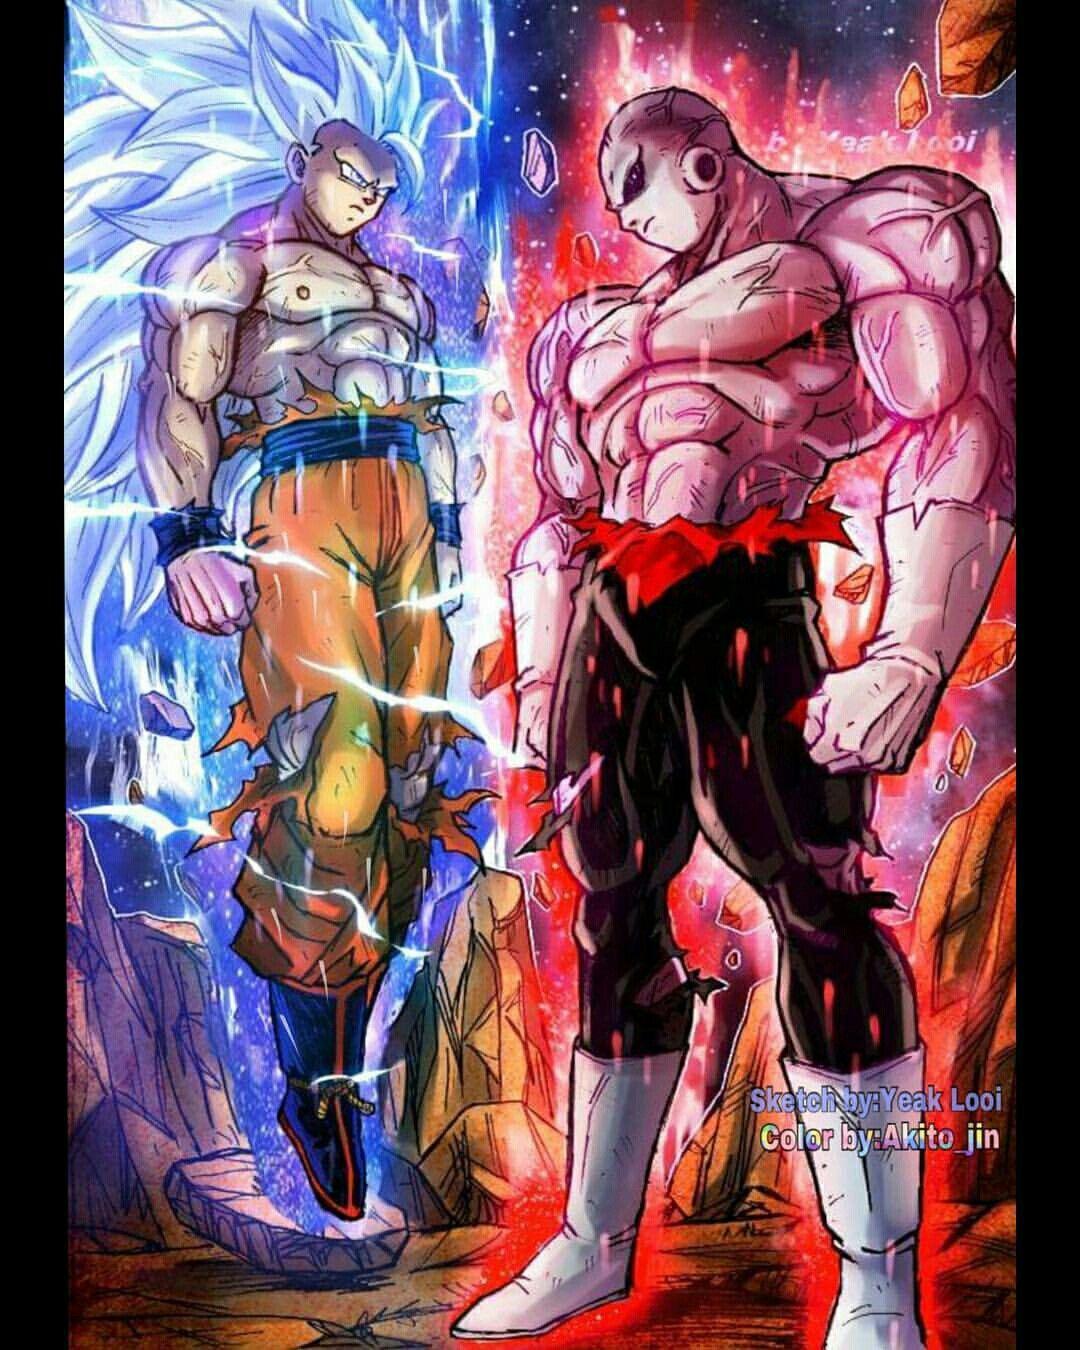 Ultra Instinct Dragon Ball Super Wallpaper: Pin By Malcolm DuBois On Dragonball